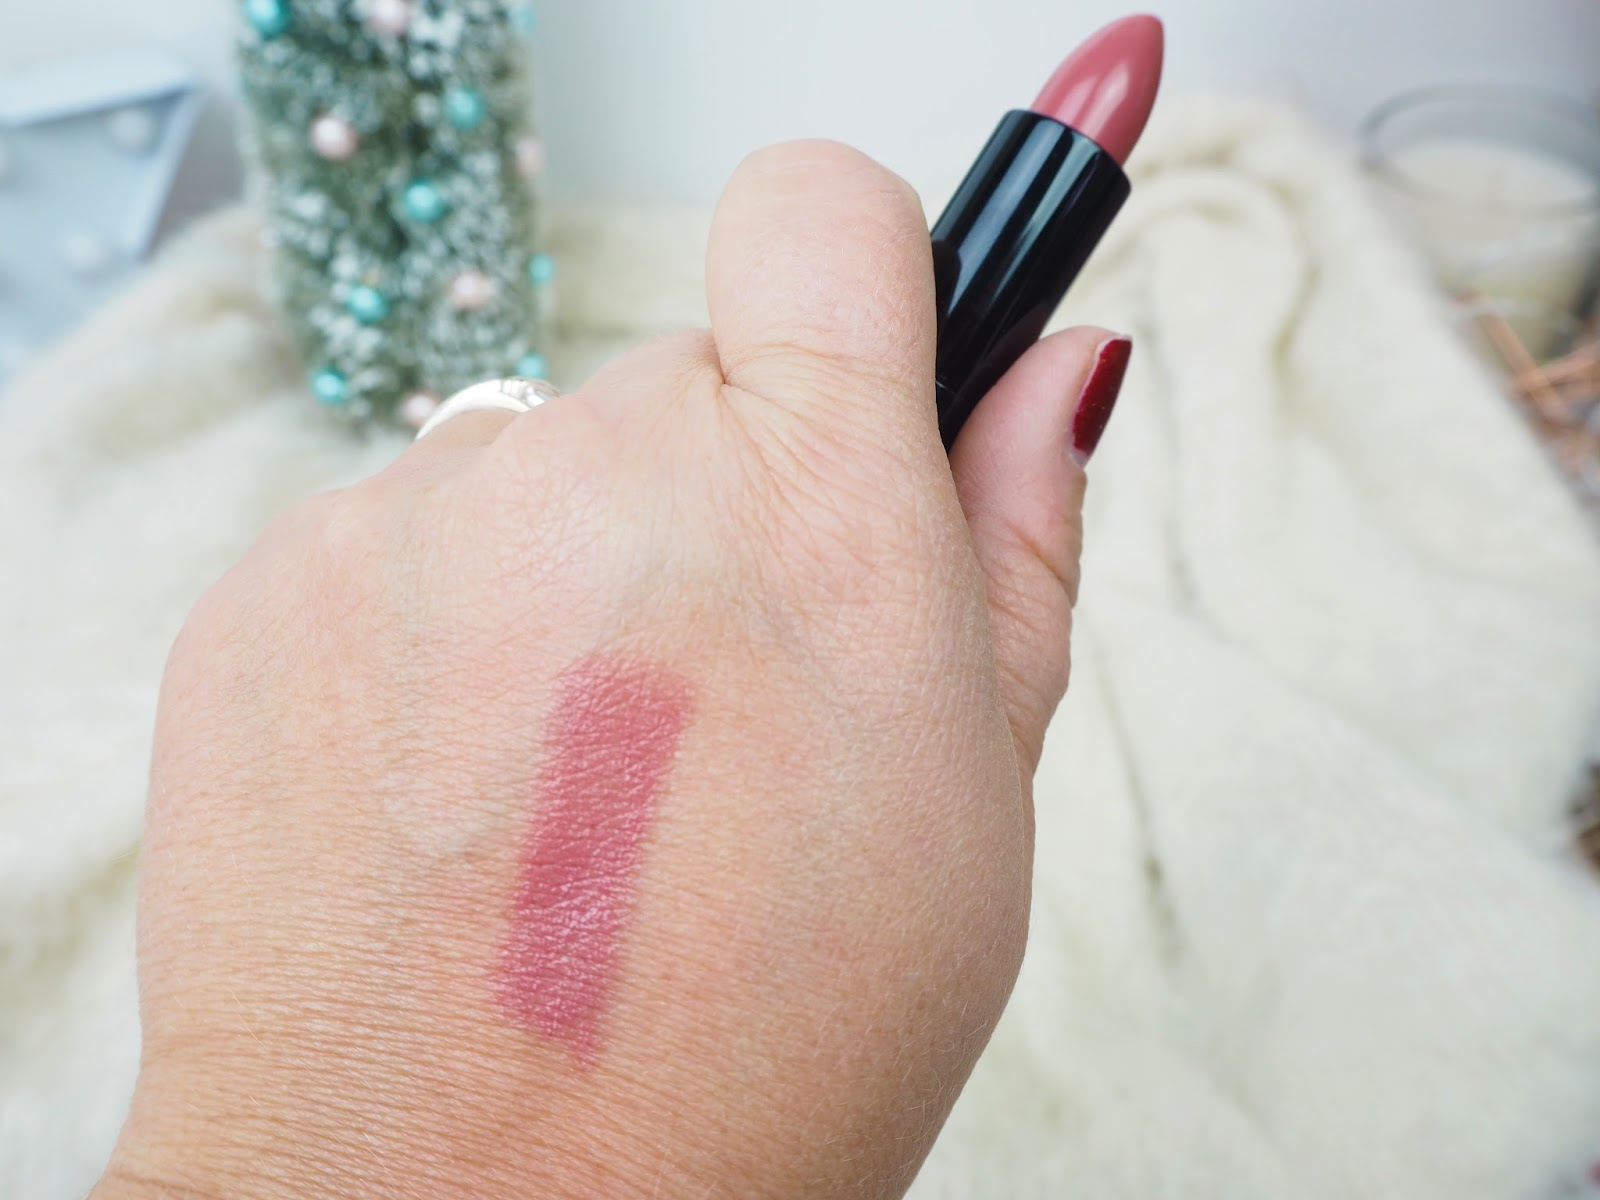 Doll 10 Hydragel Lipstick in Star-Struck